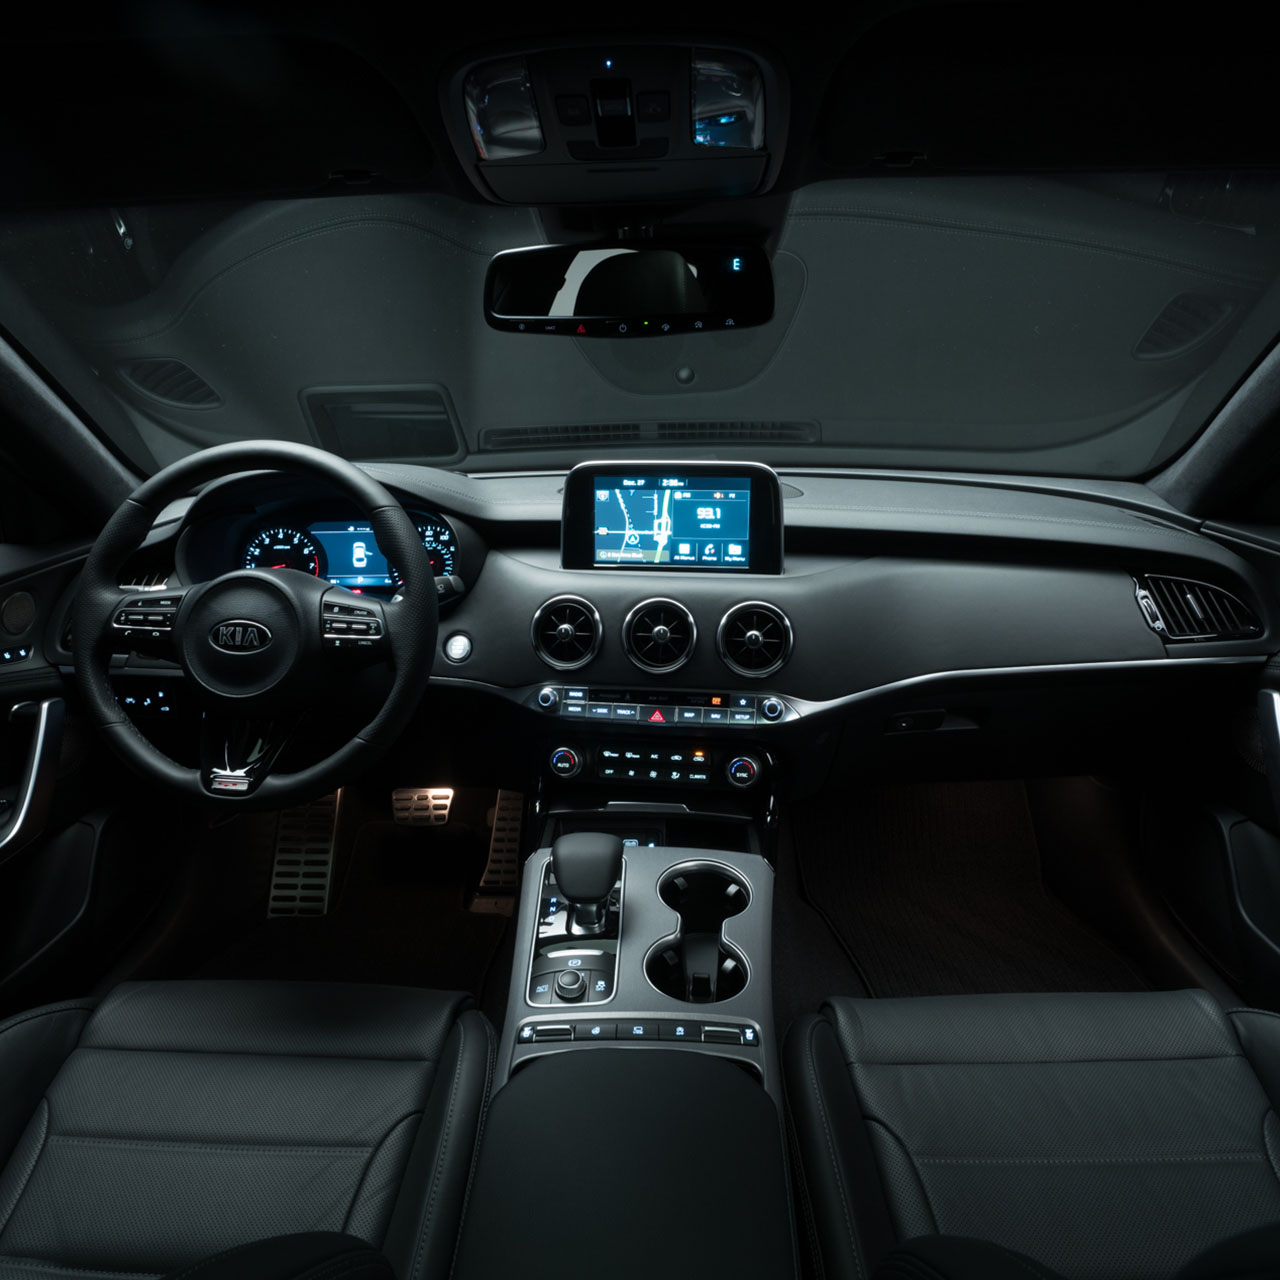 Interior of the 2018 Kia Stinger